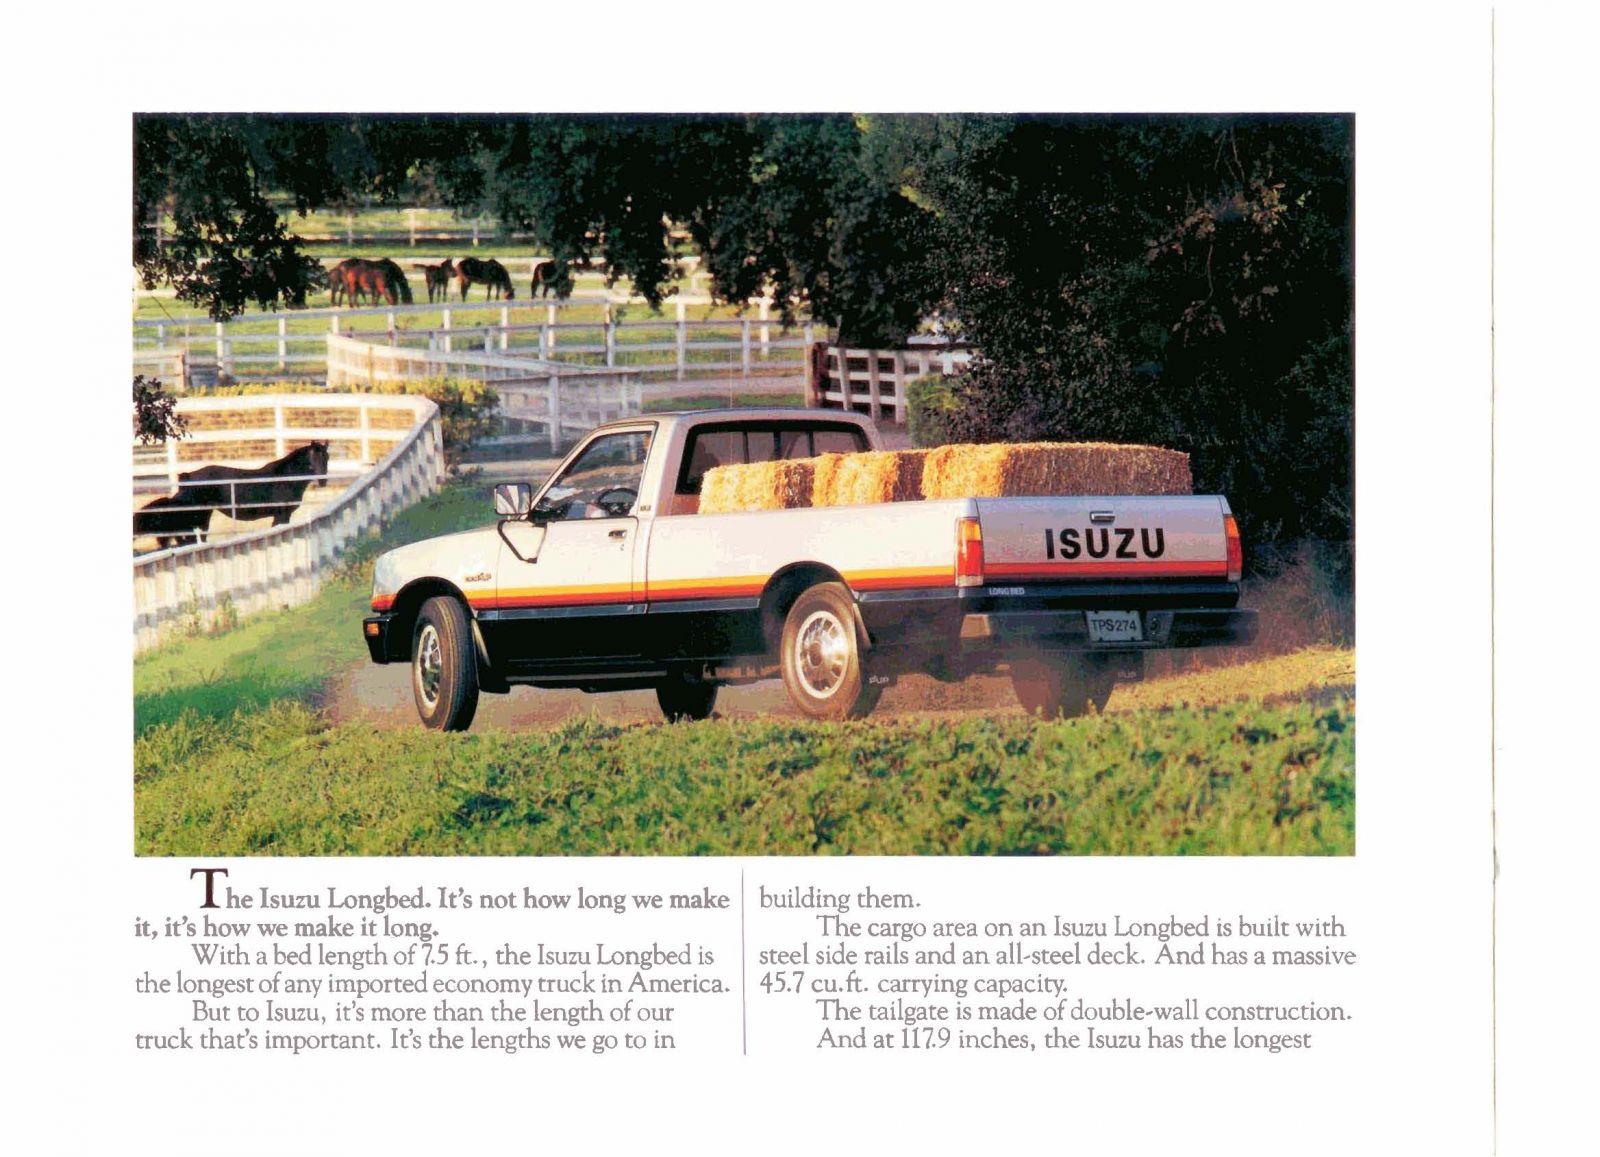 1982 Isuzu Pickups Page 04.jpg